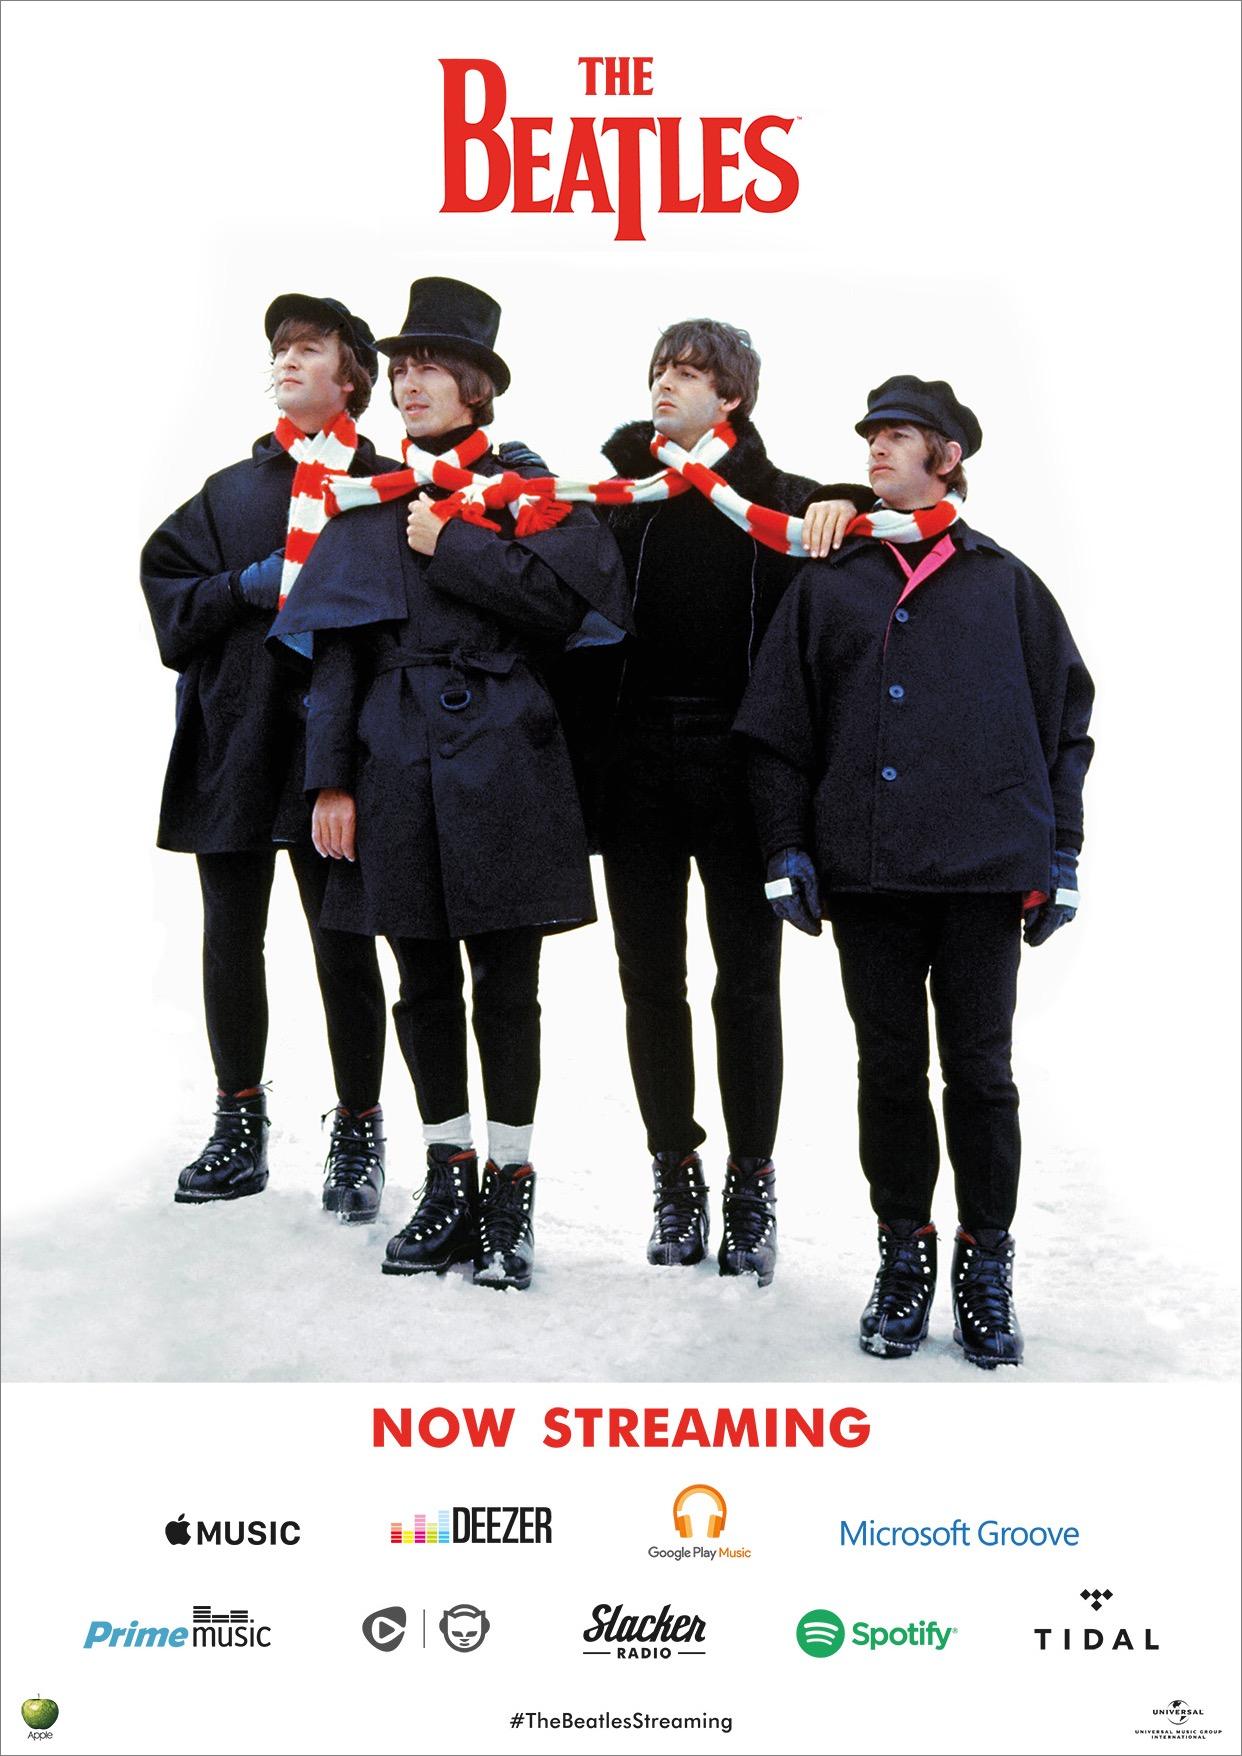 Beatles now streaming